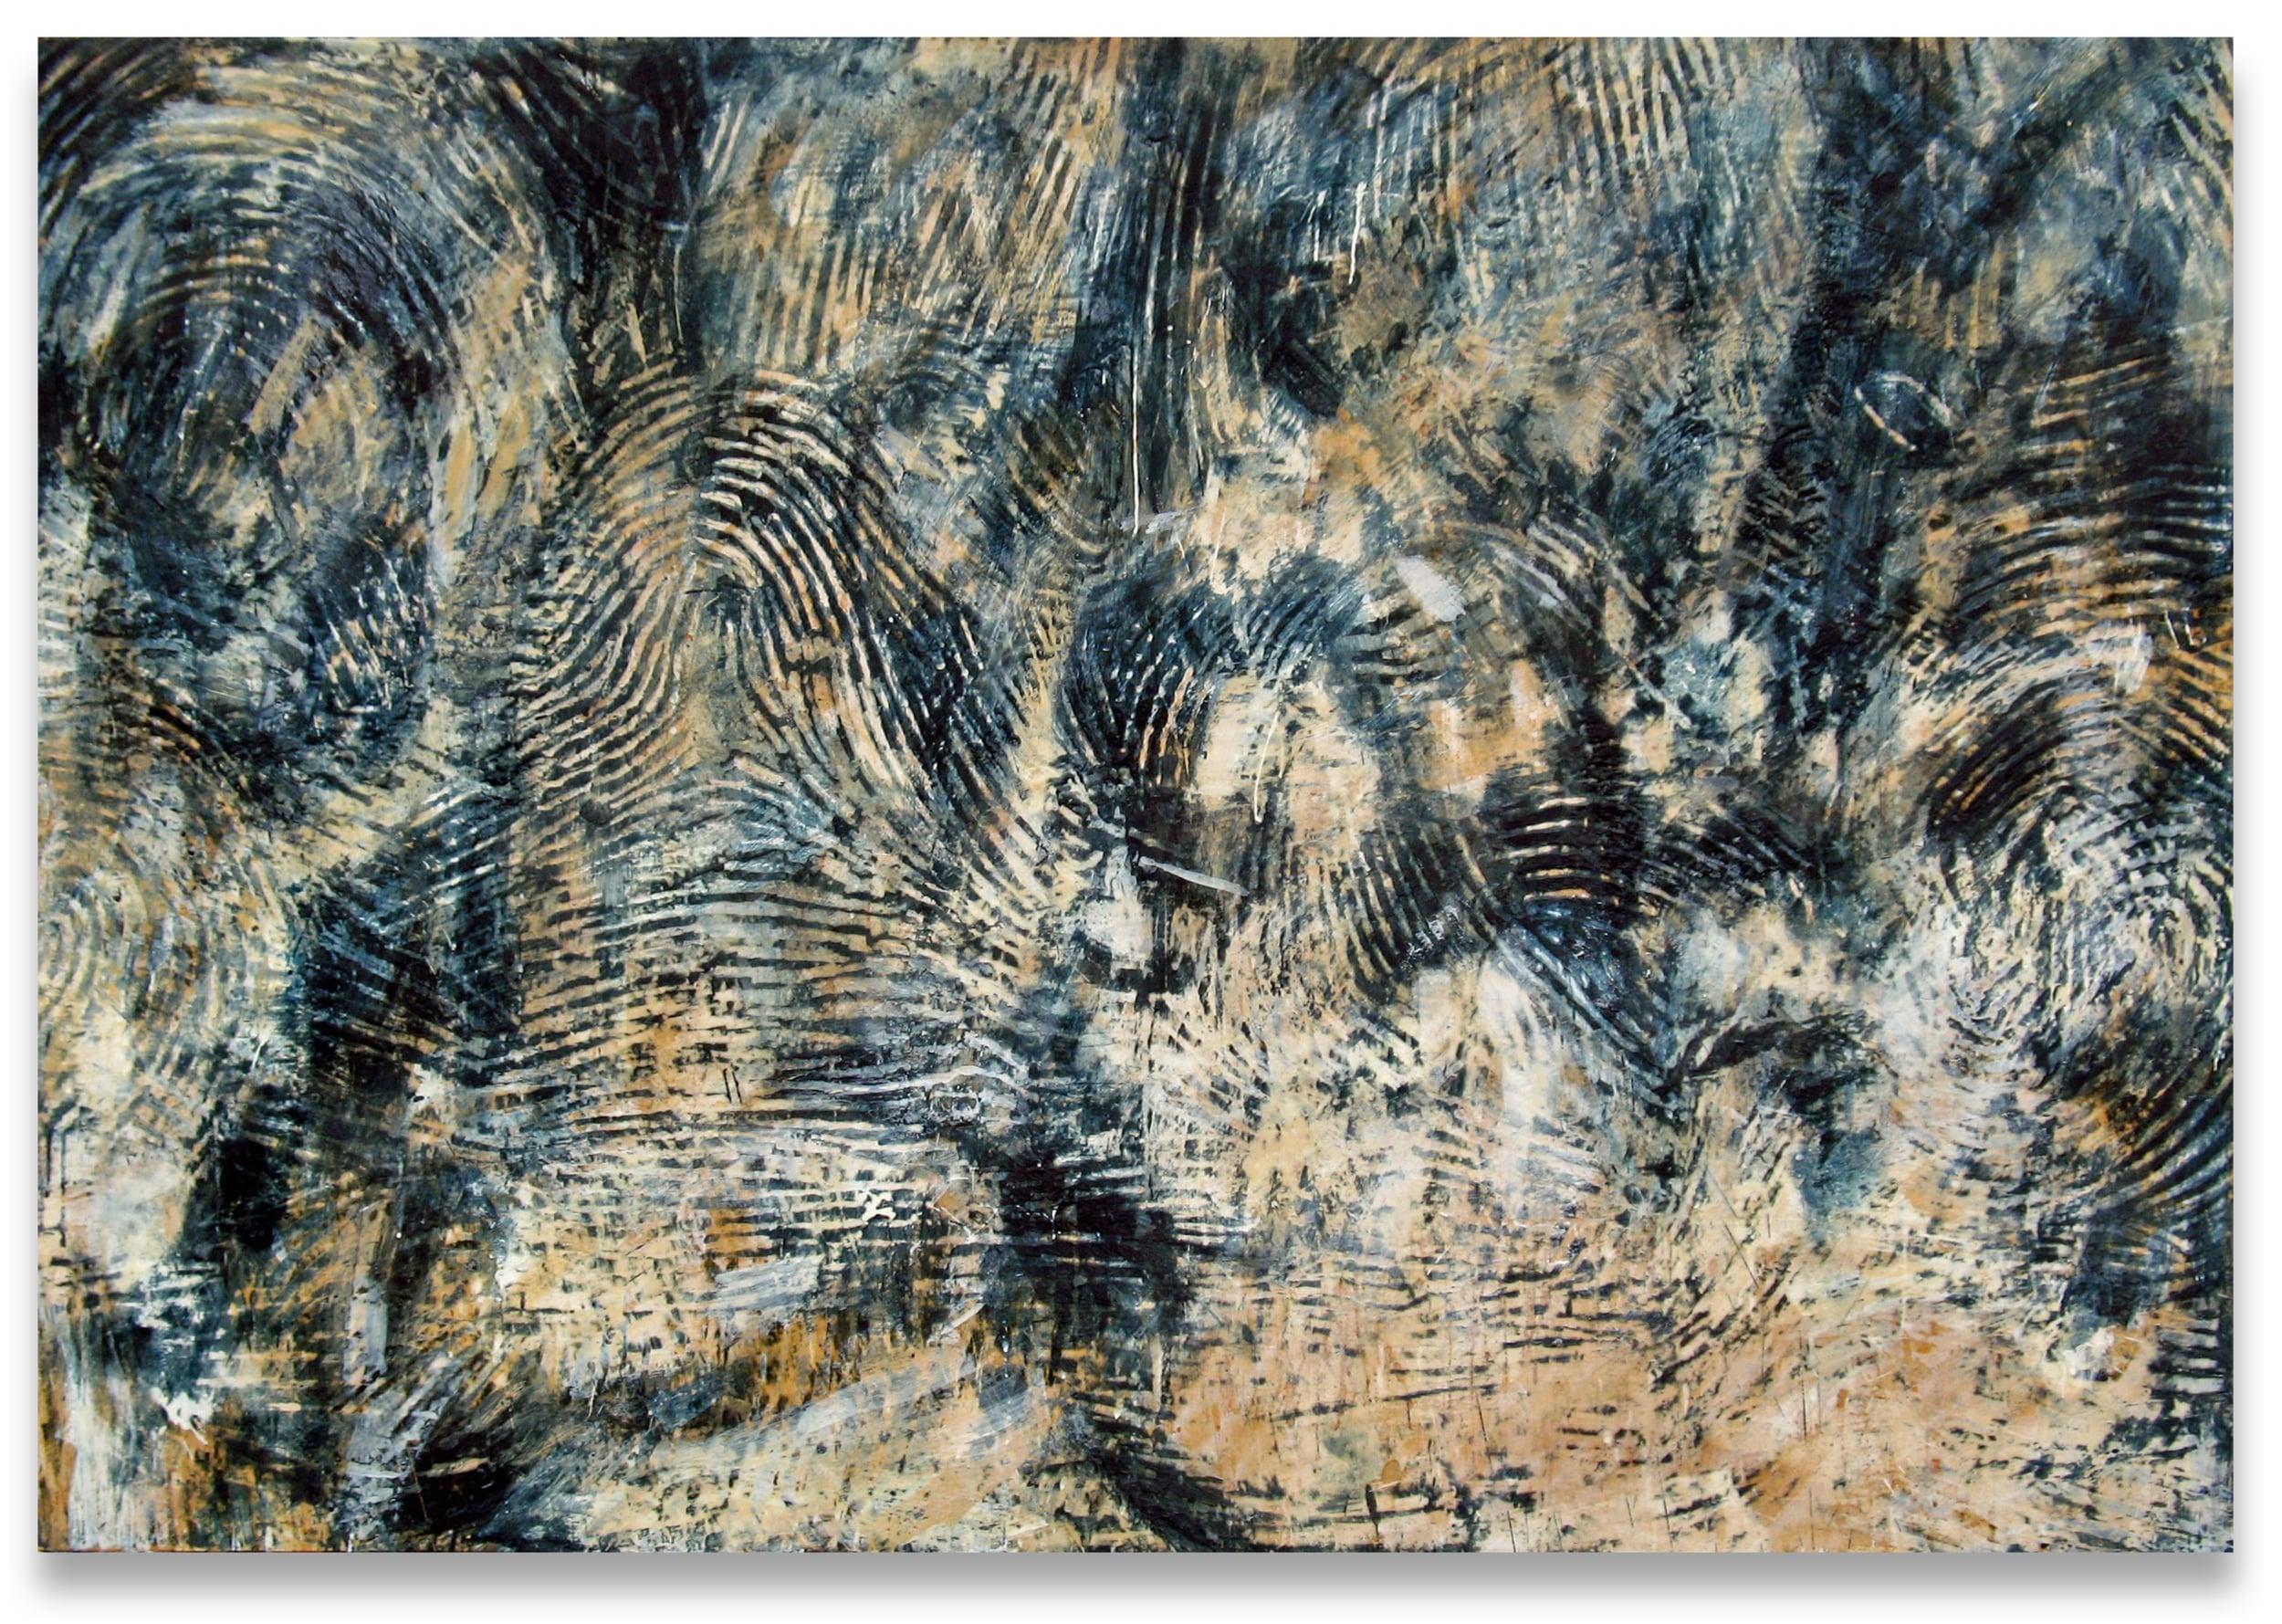 Exhibits detail (Exhibit B – fingerprints on a windowpane), 2004